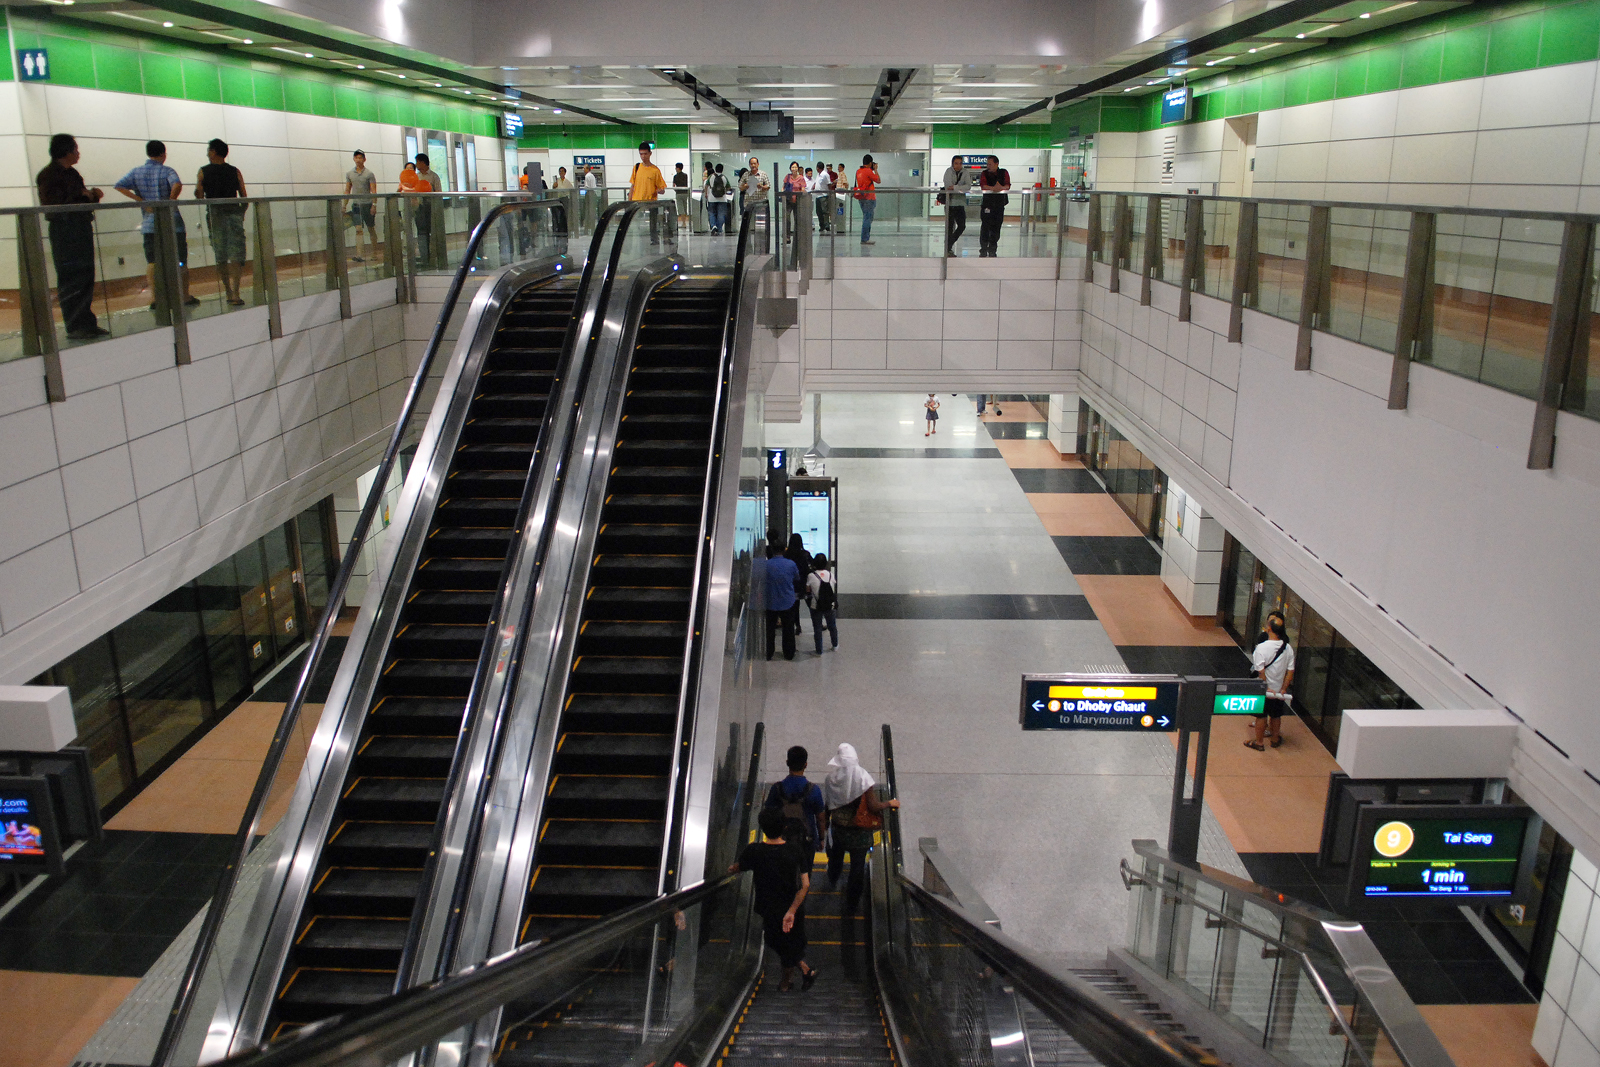 FileDakota MRT Stationjpg  Wikimedia Commons